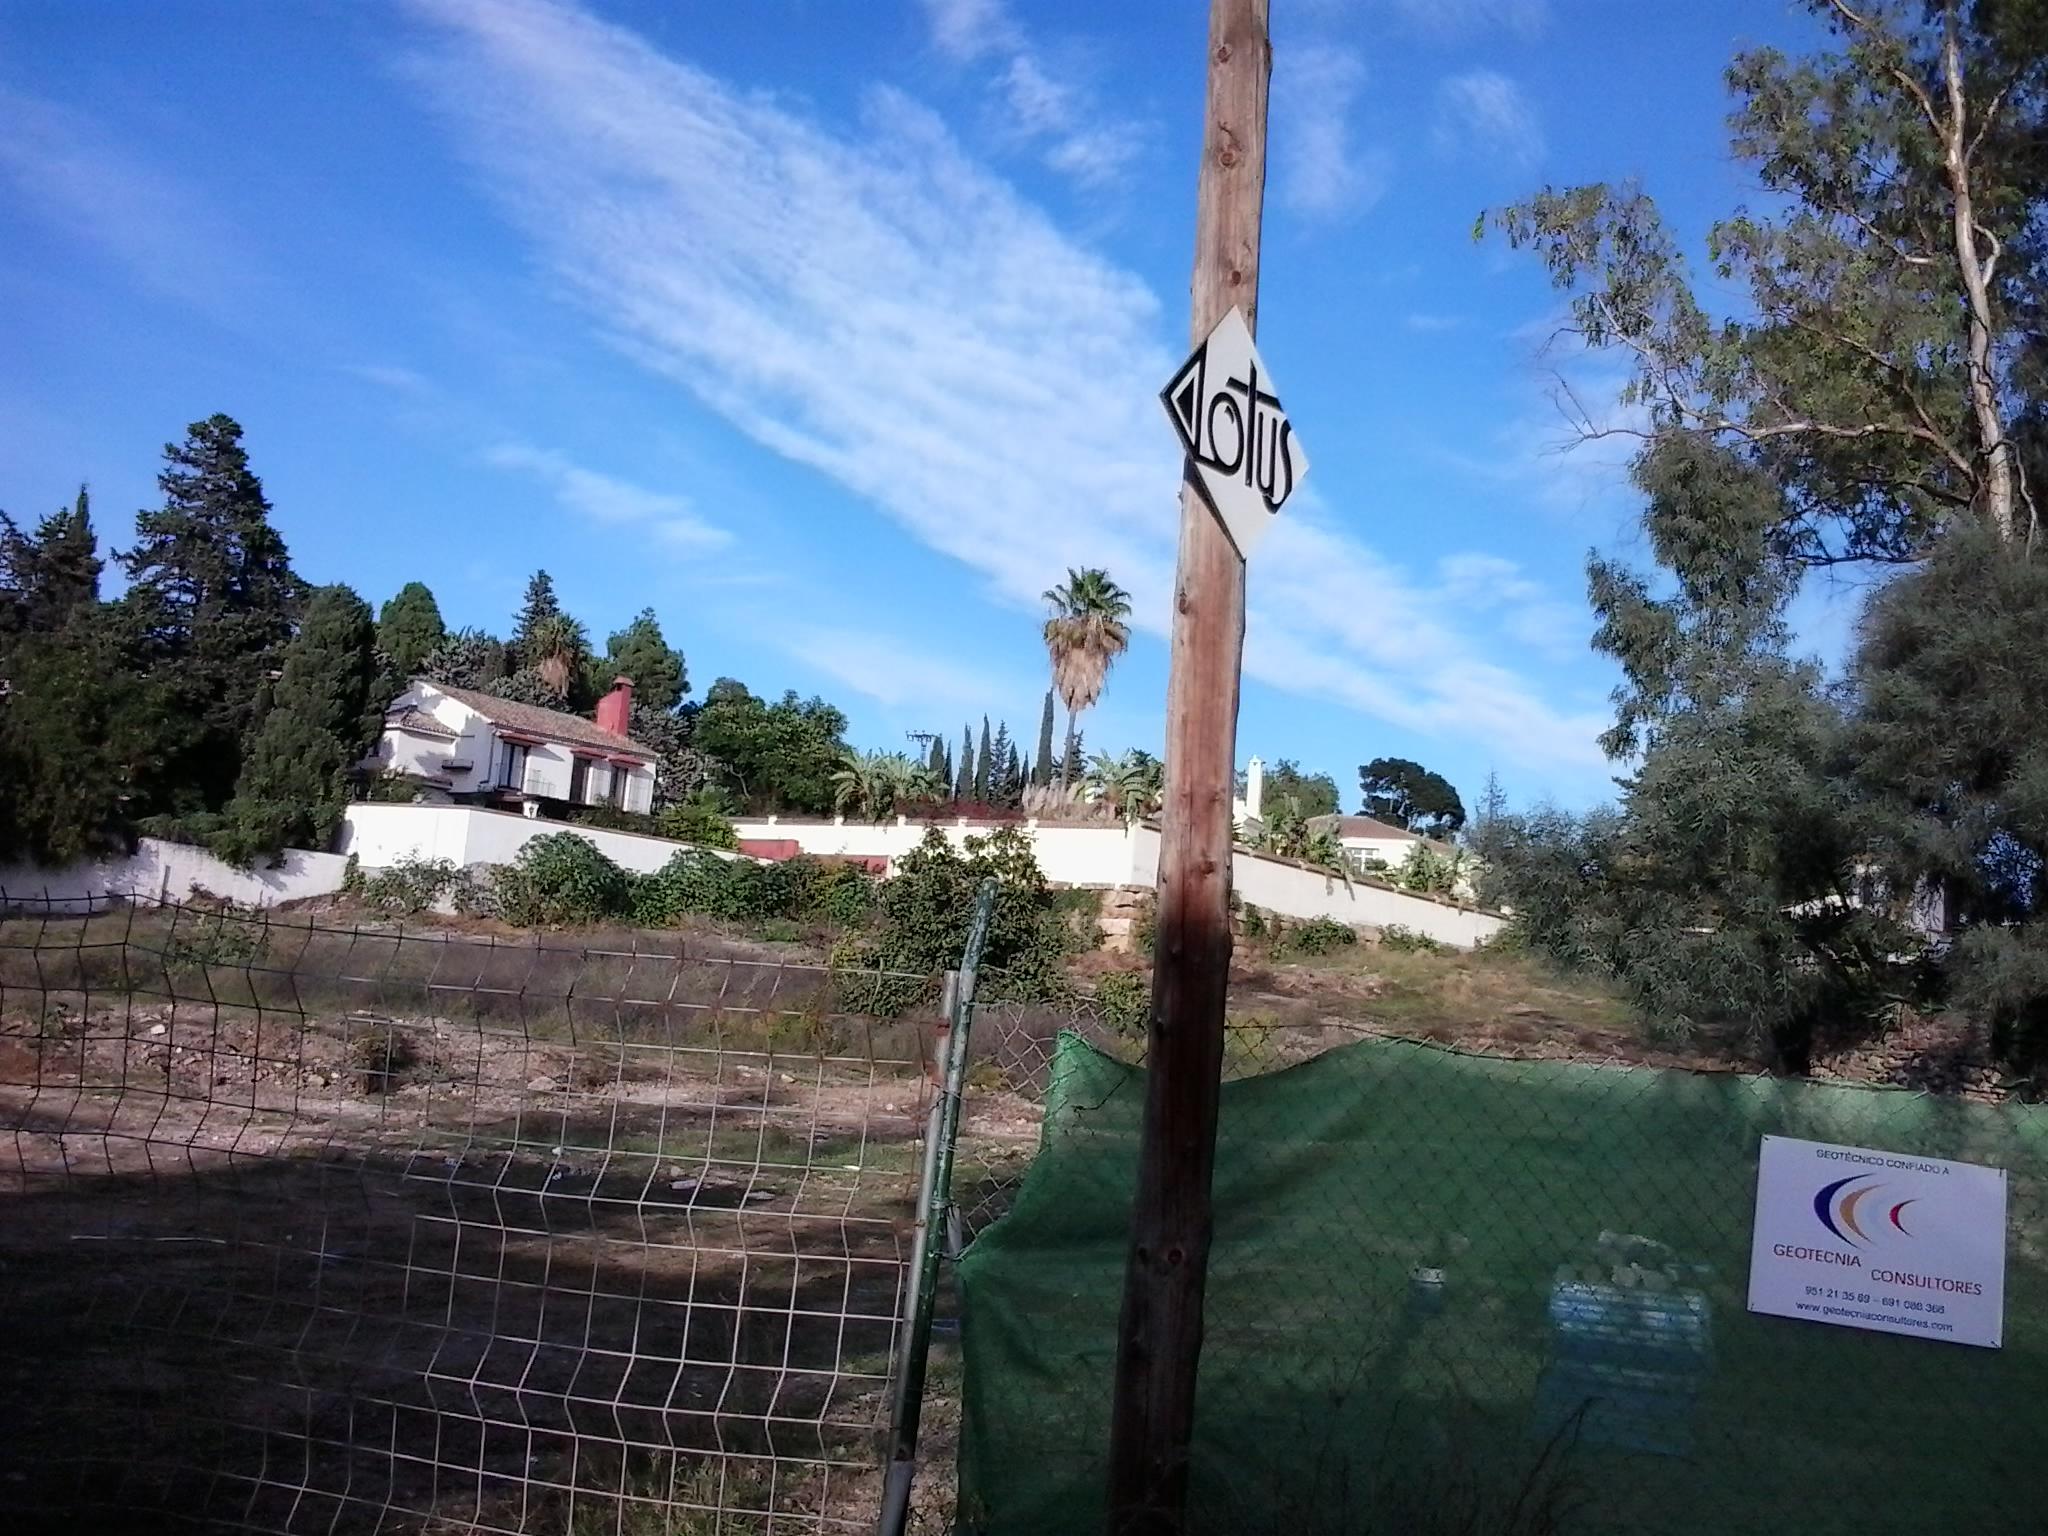 Sondeo Geotécnico Marbella